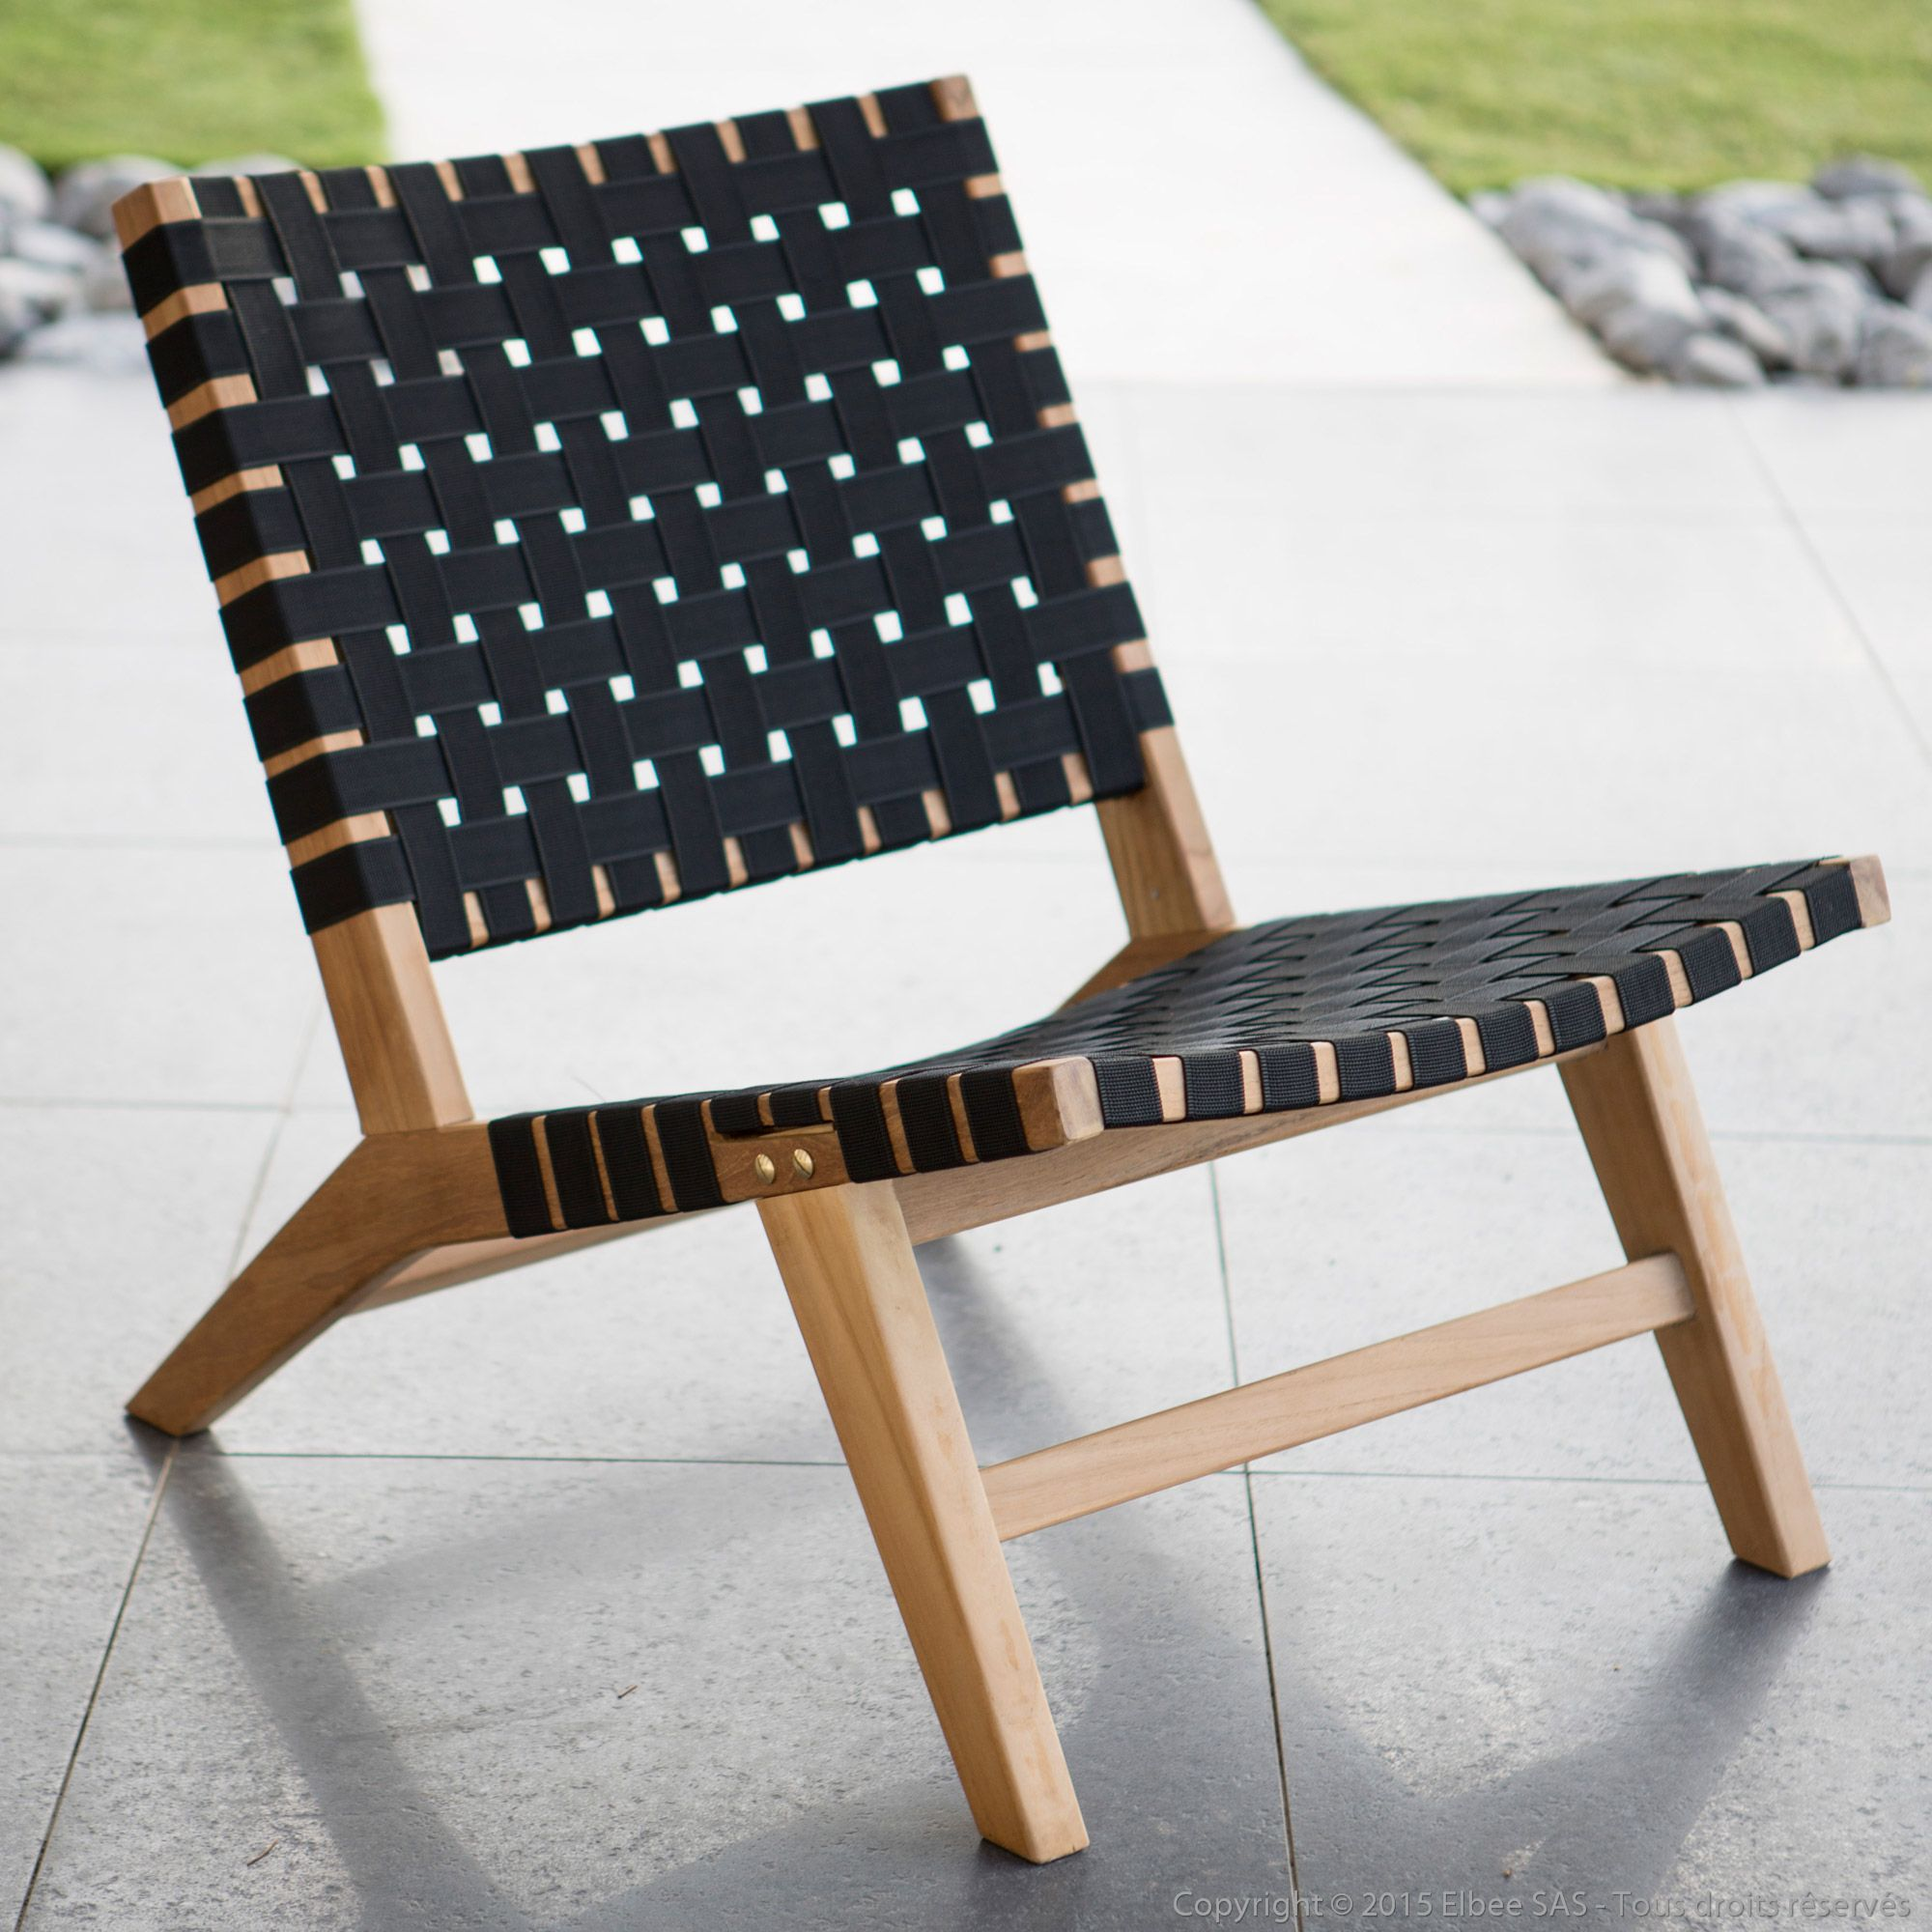 fauteuil bas de jardin en teck brut et corde tress e ethnika ermanno g port offert coups de. Black Bedroom Furniture Sets. Home Design Ideas